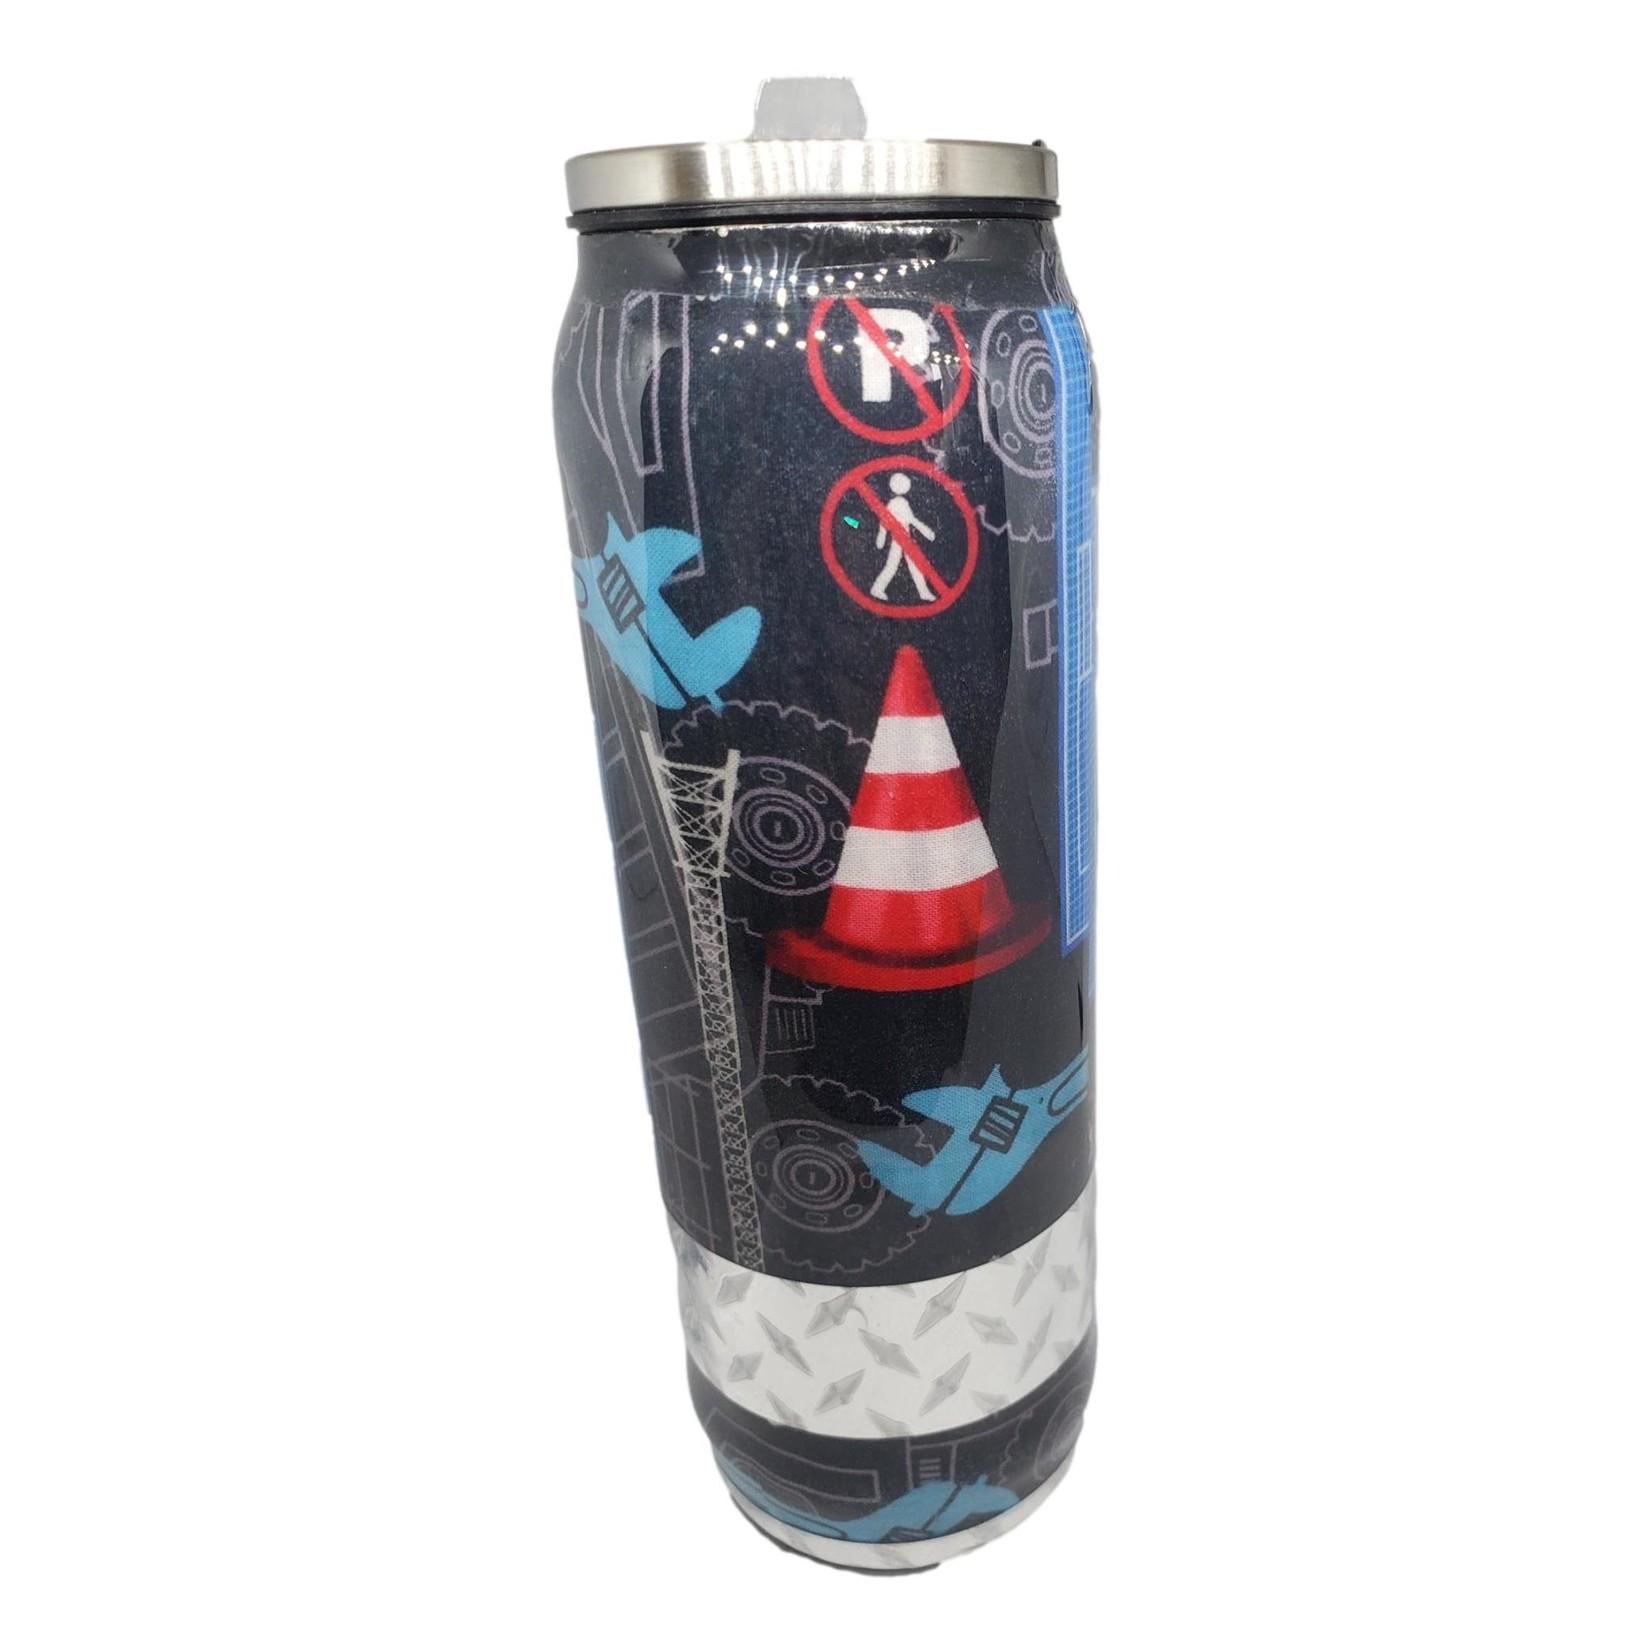 East Coast Sirens Construction Tumbler - 500ml Tall Coke Can